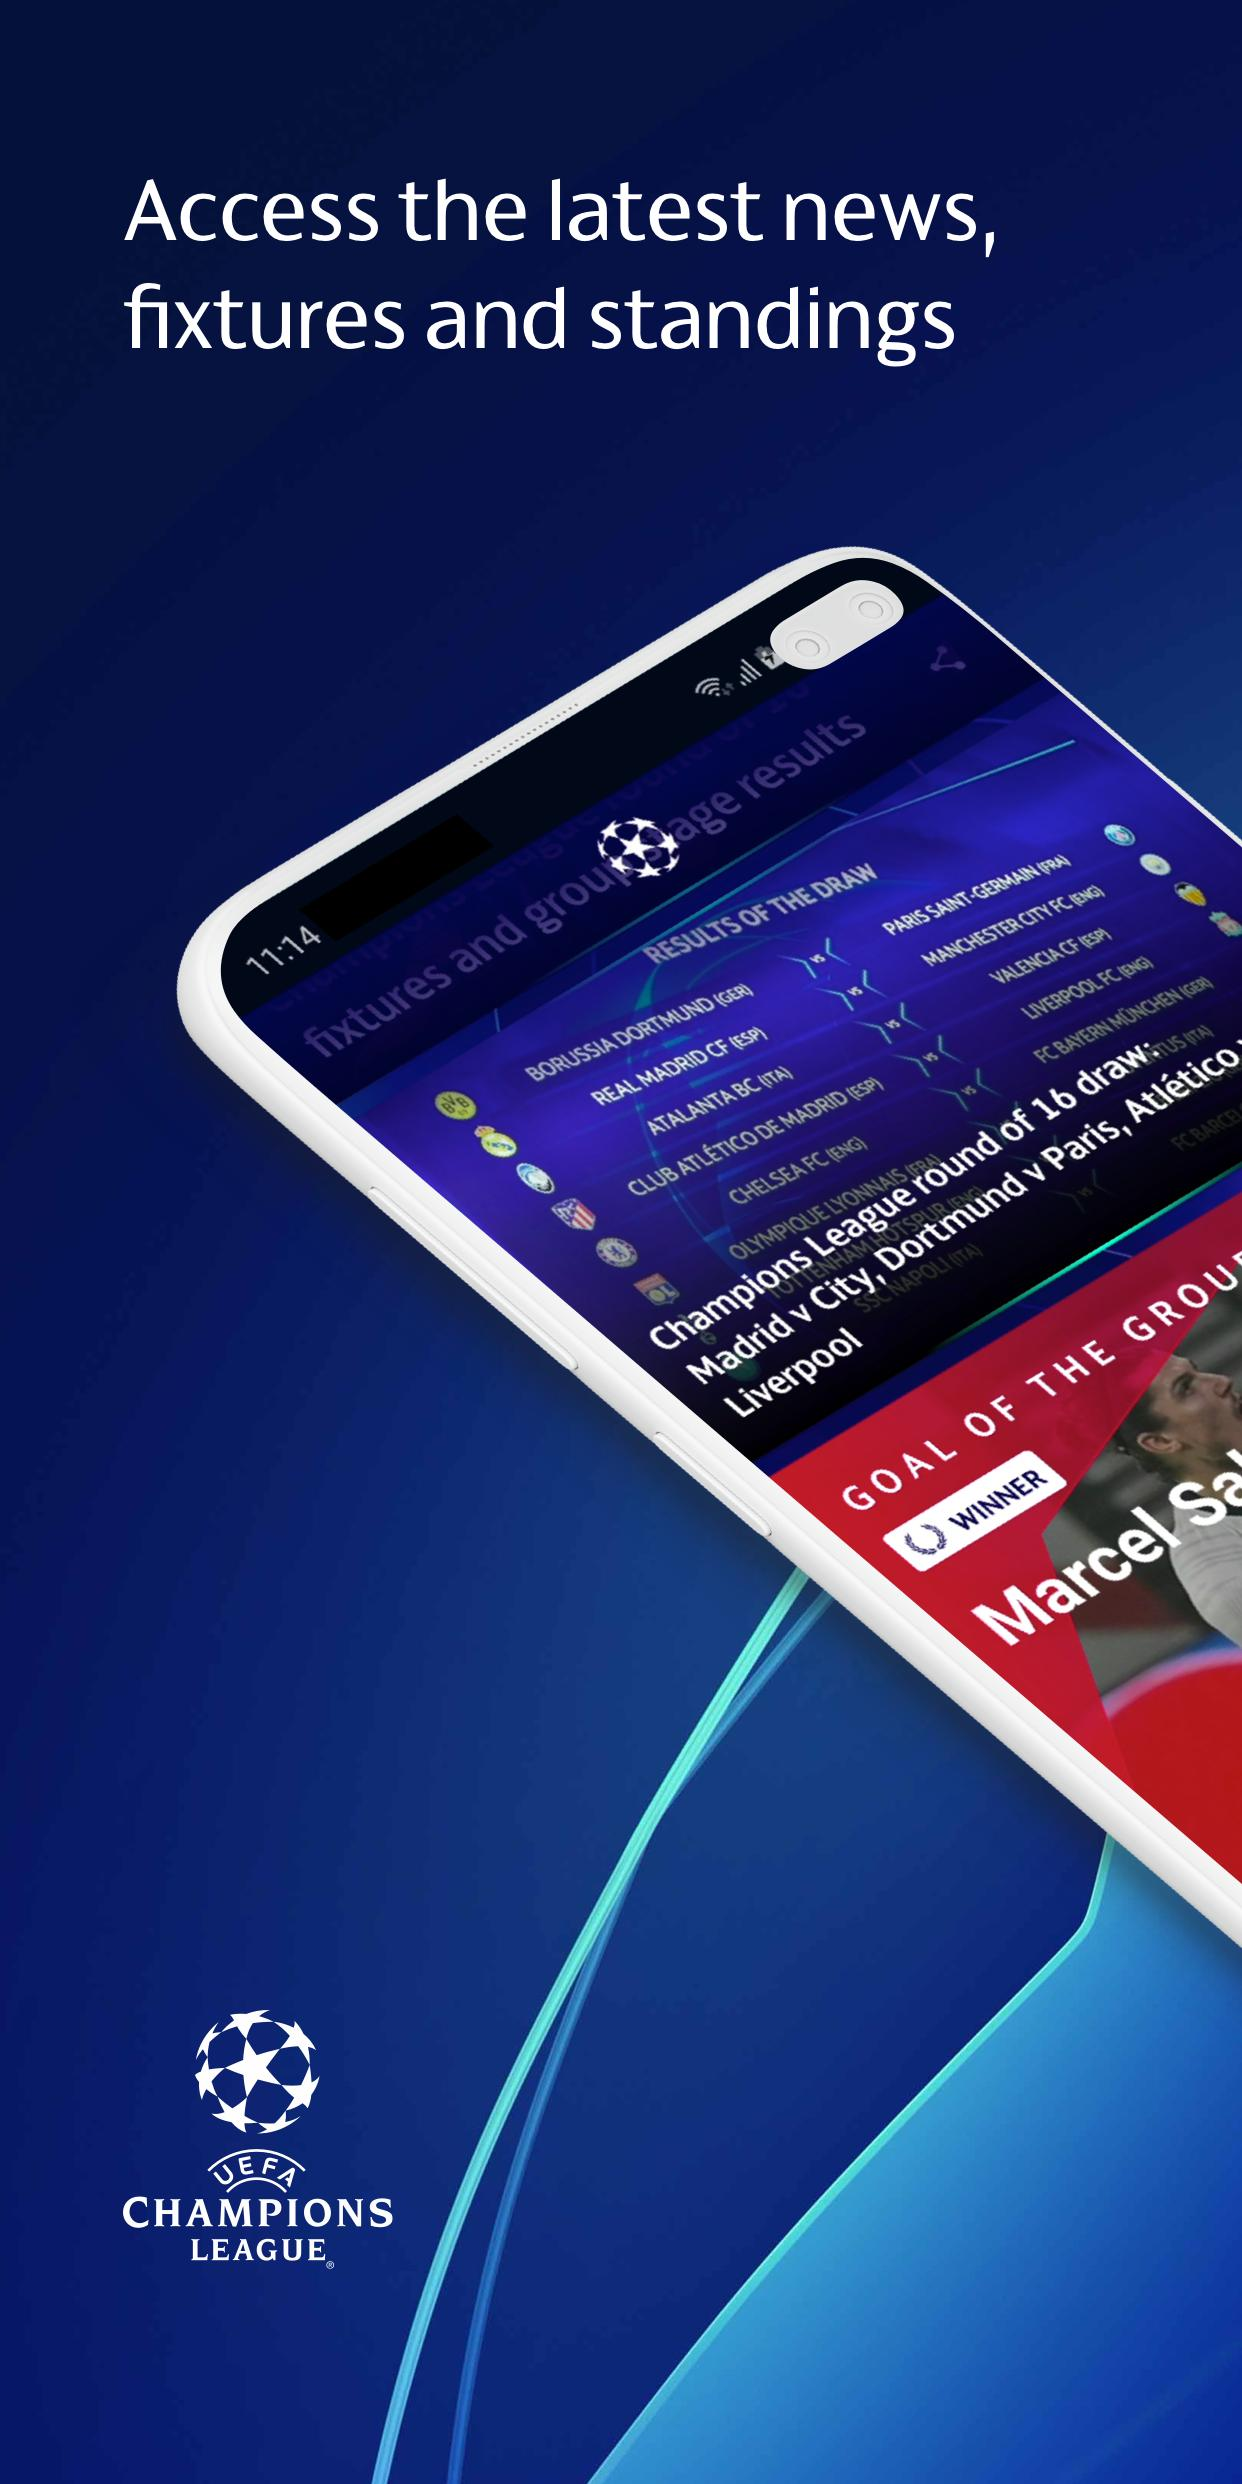 uefa champions league football live scores news for android apk download uefa champions league football live